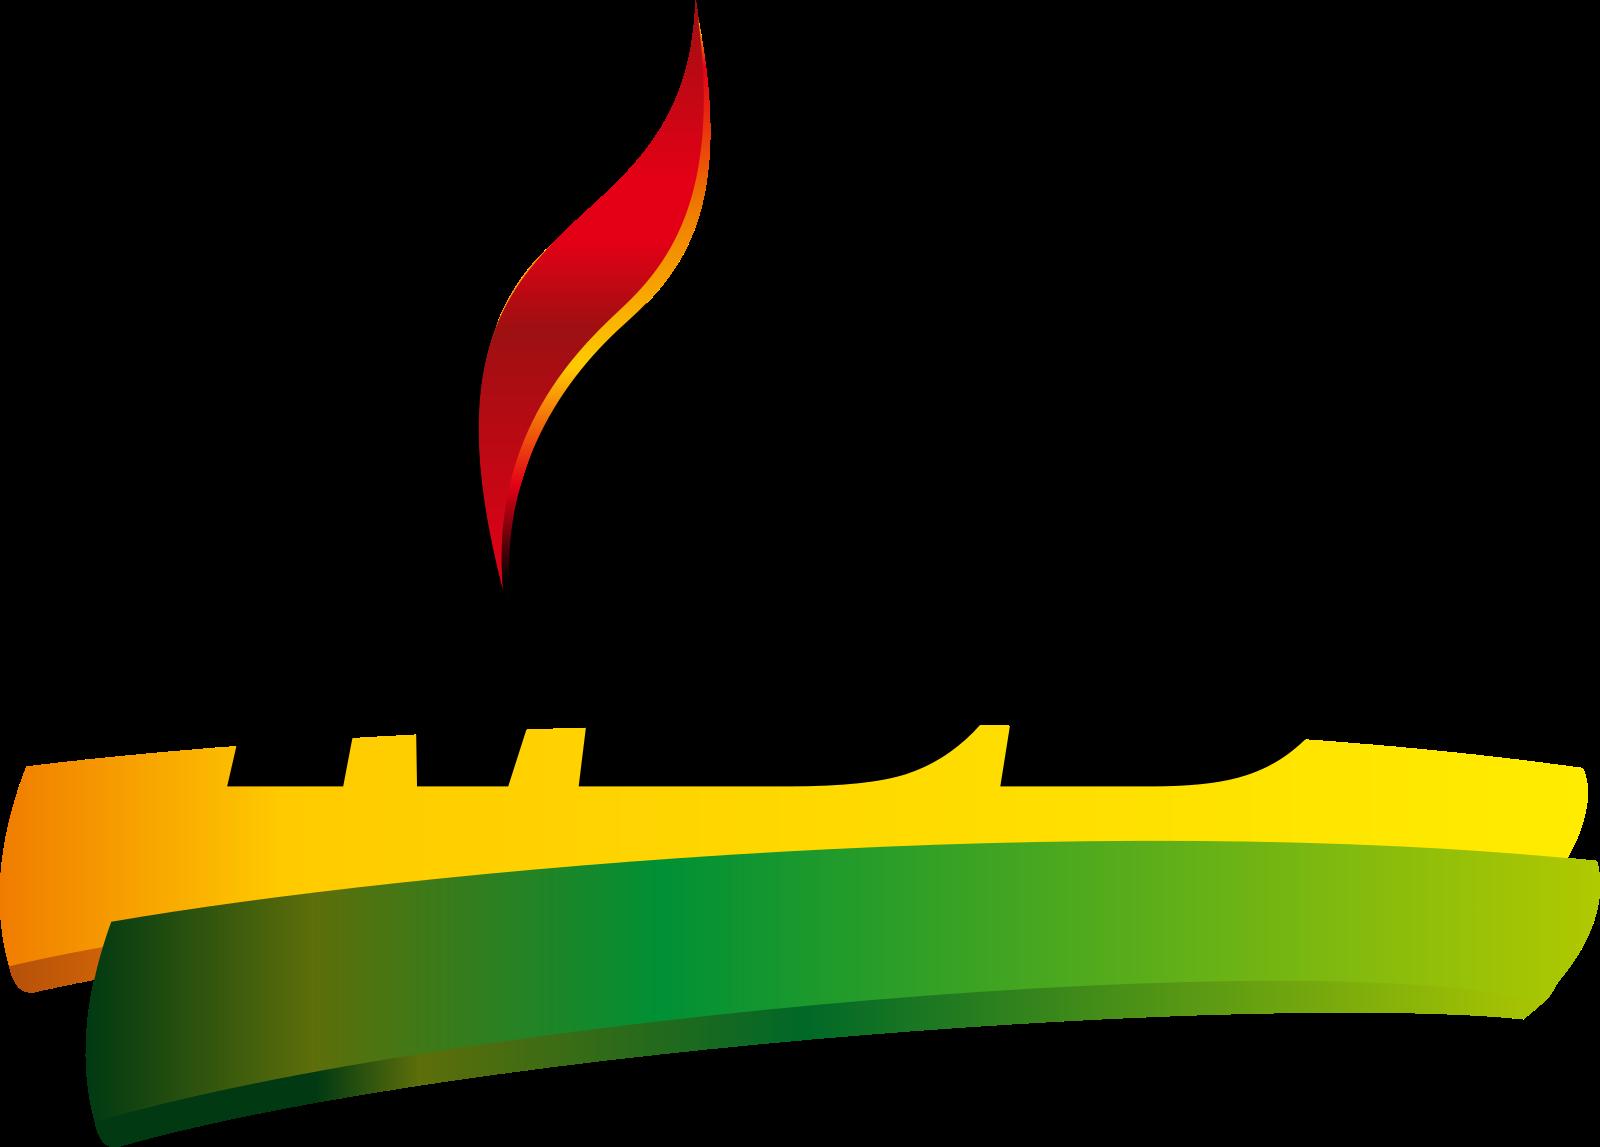 mdb logo partido 3 - MDB Logo - Movimento Democrático Brasileiro Logo